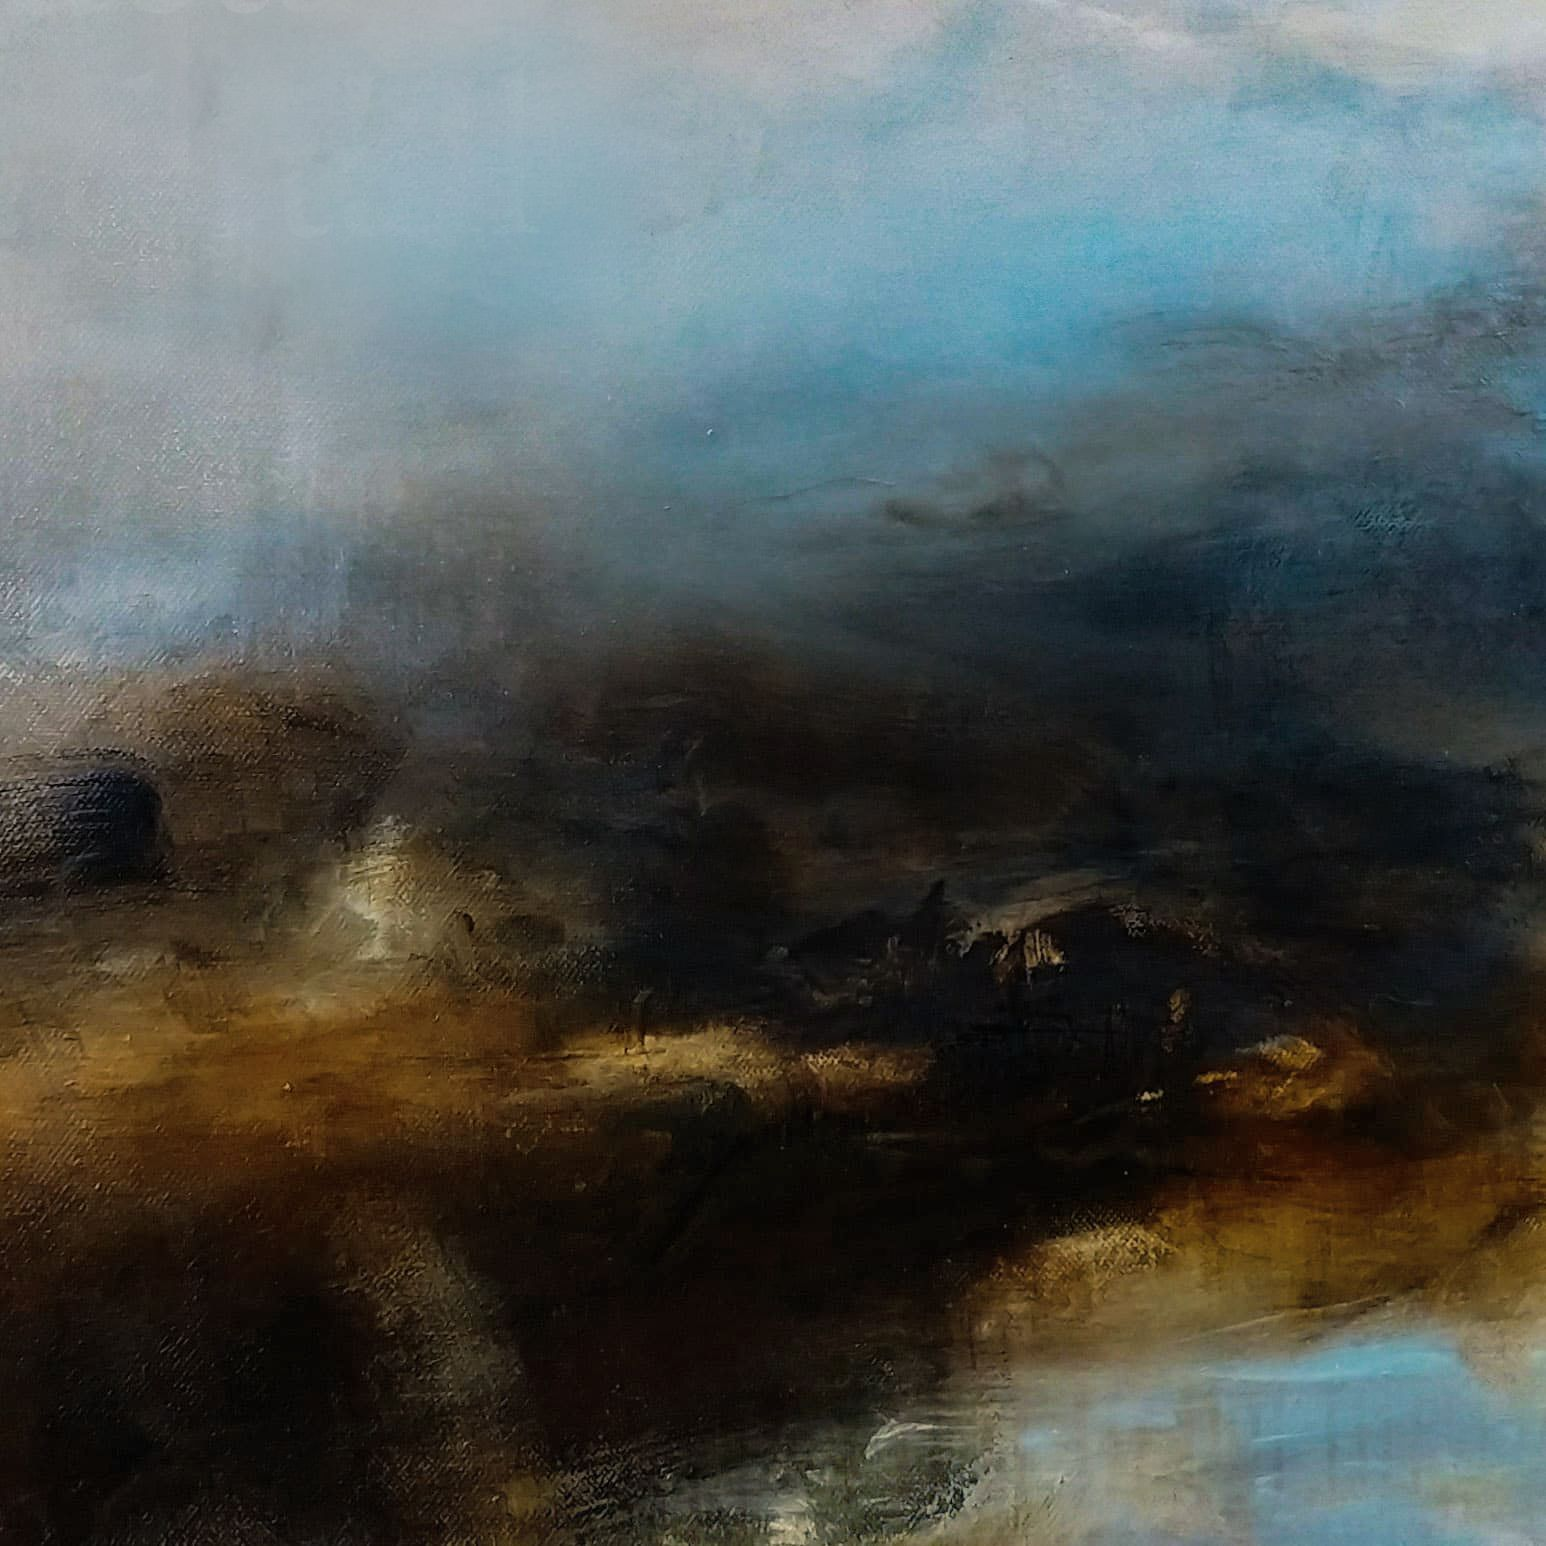 Kerr Ashmore Landscape Painting Contemporary Art Abstract Landscape Abstract Art Painting Landscape Art Modern Artwork